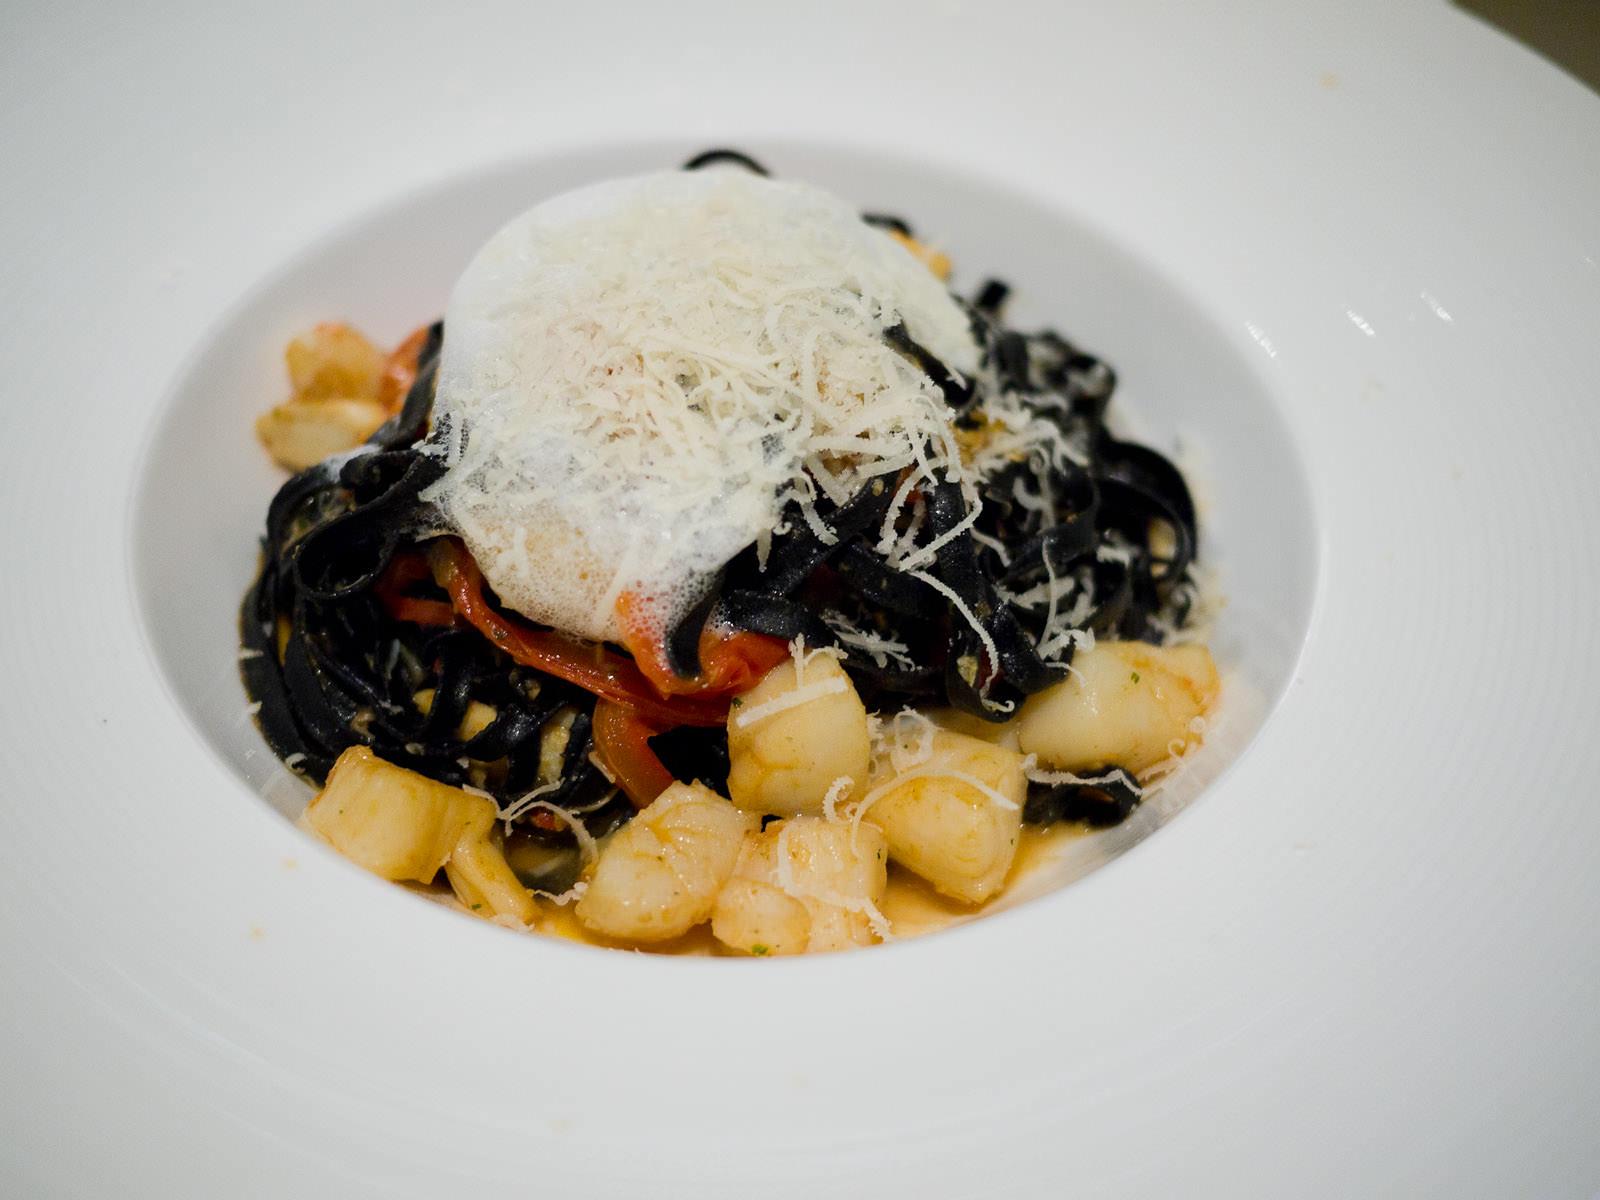 Black ink fettuccine, crab, scallops, red capsicum, white wine, garlic and chilli, AU$30